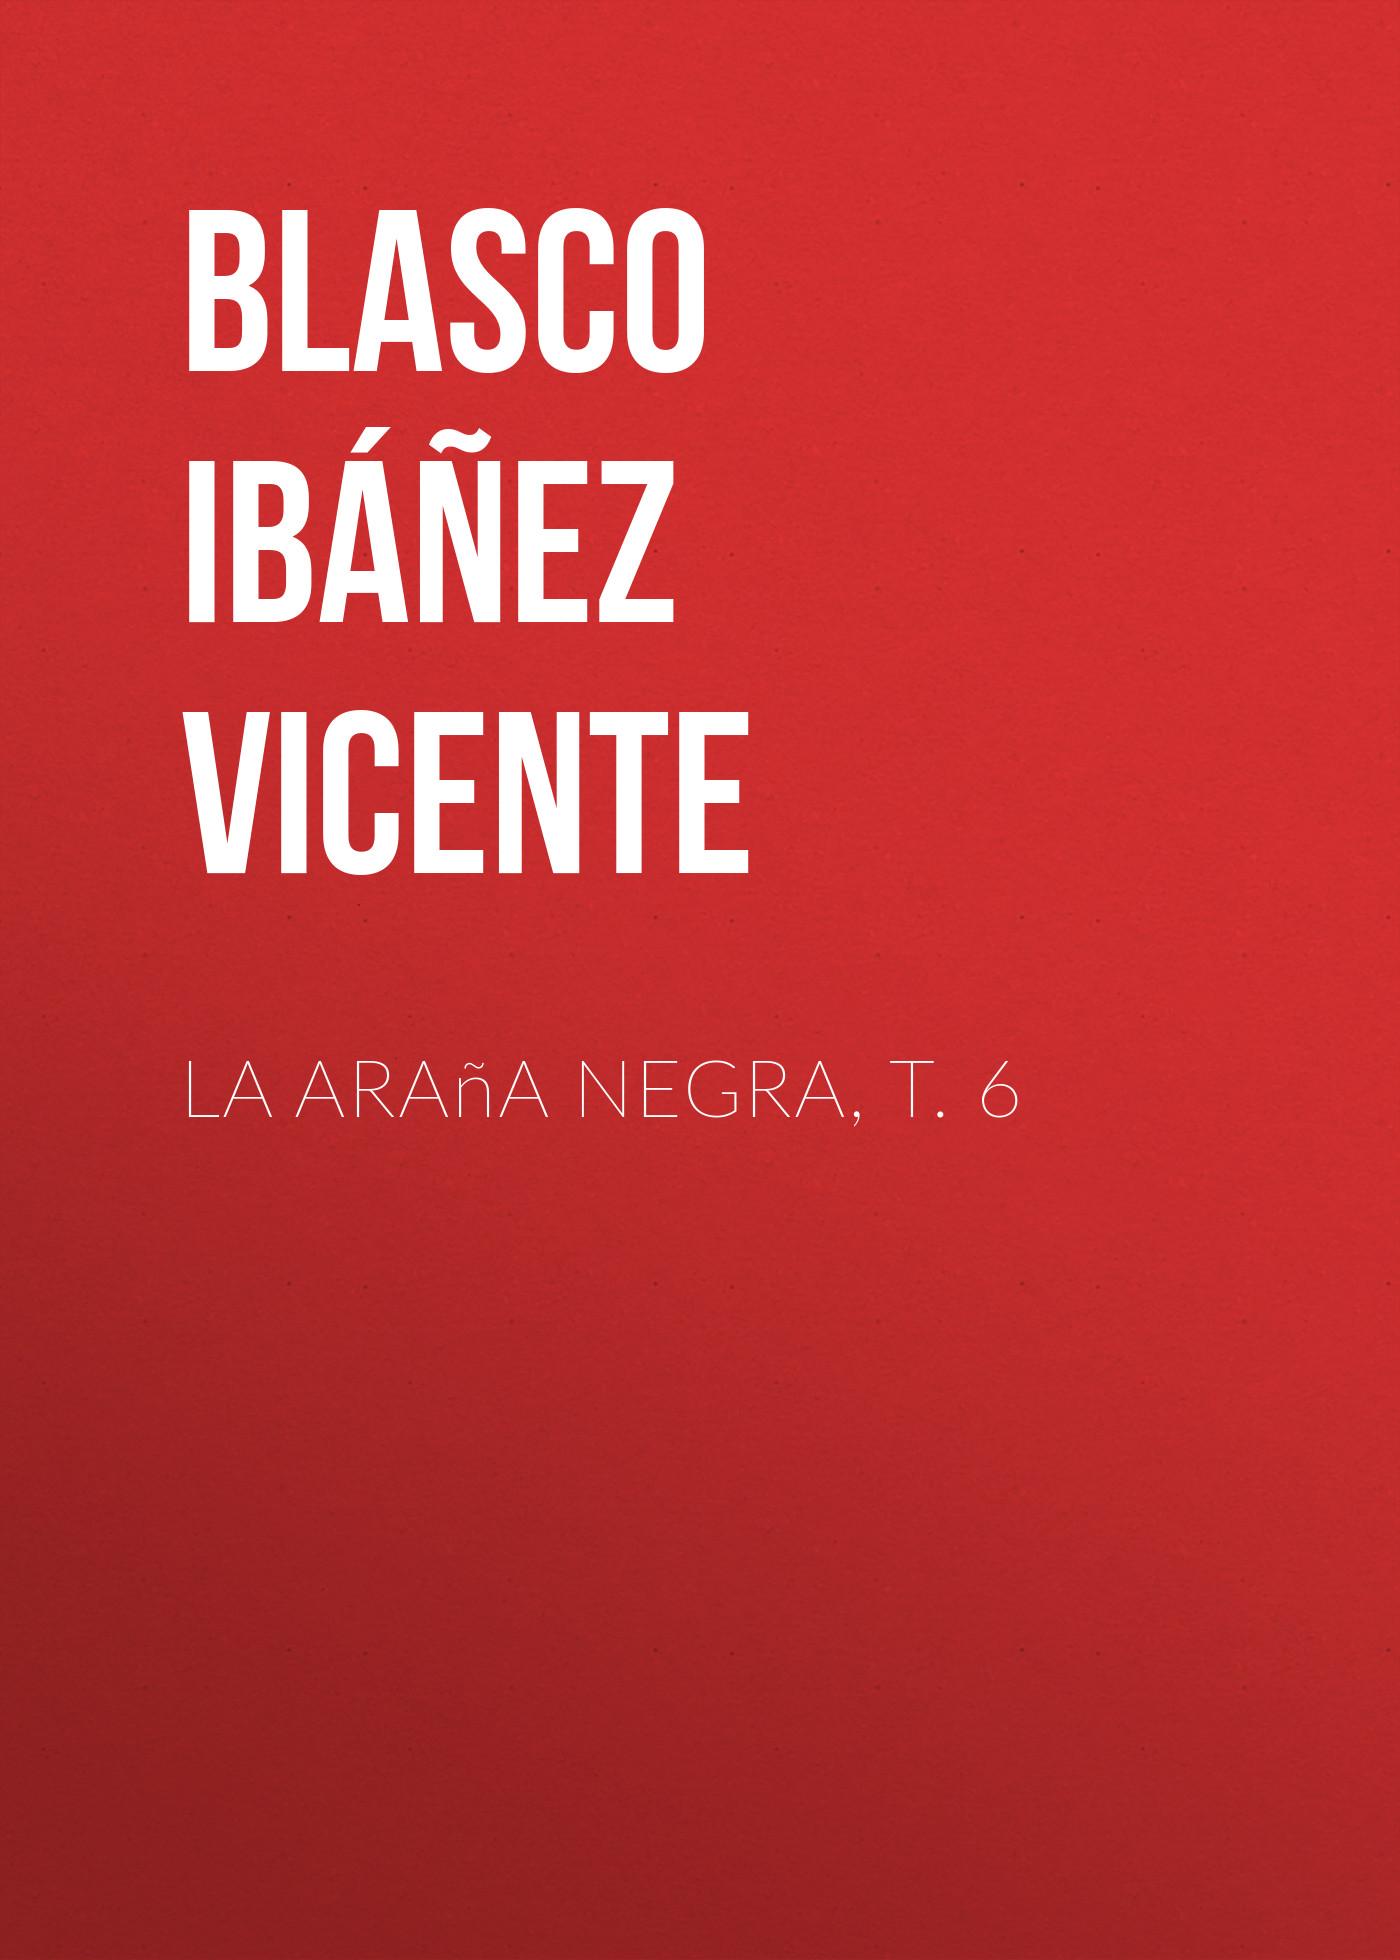 Blasco Ibáñez Vicente La araña negra, t. 6 blasco ibáñez vicente la araña negra t 1